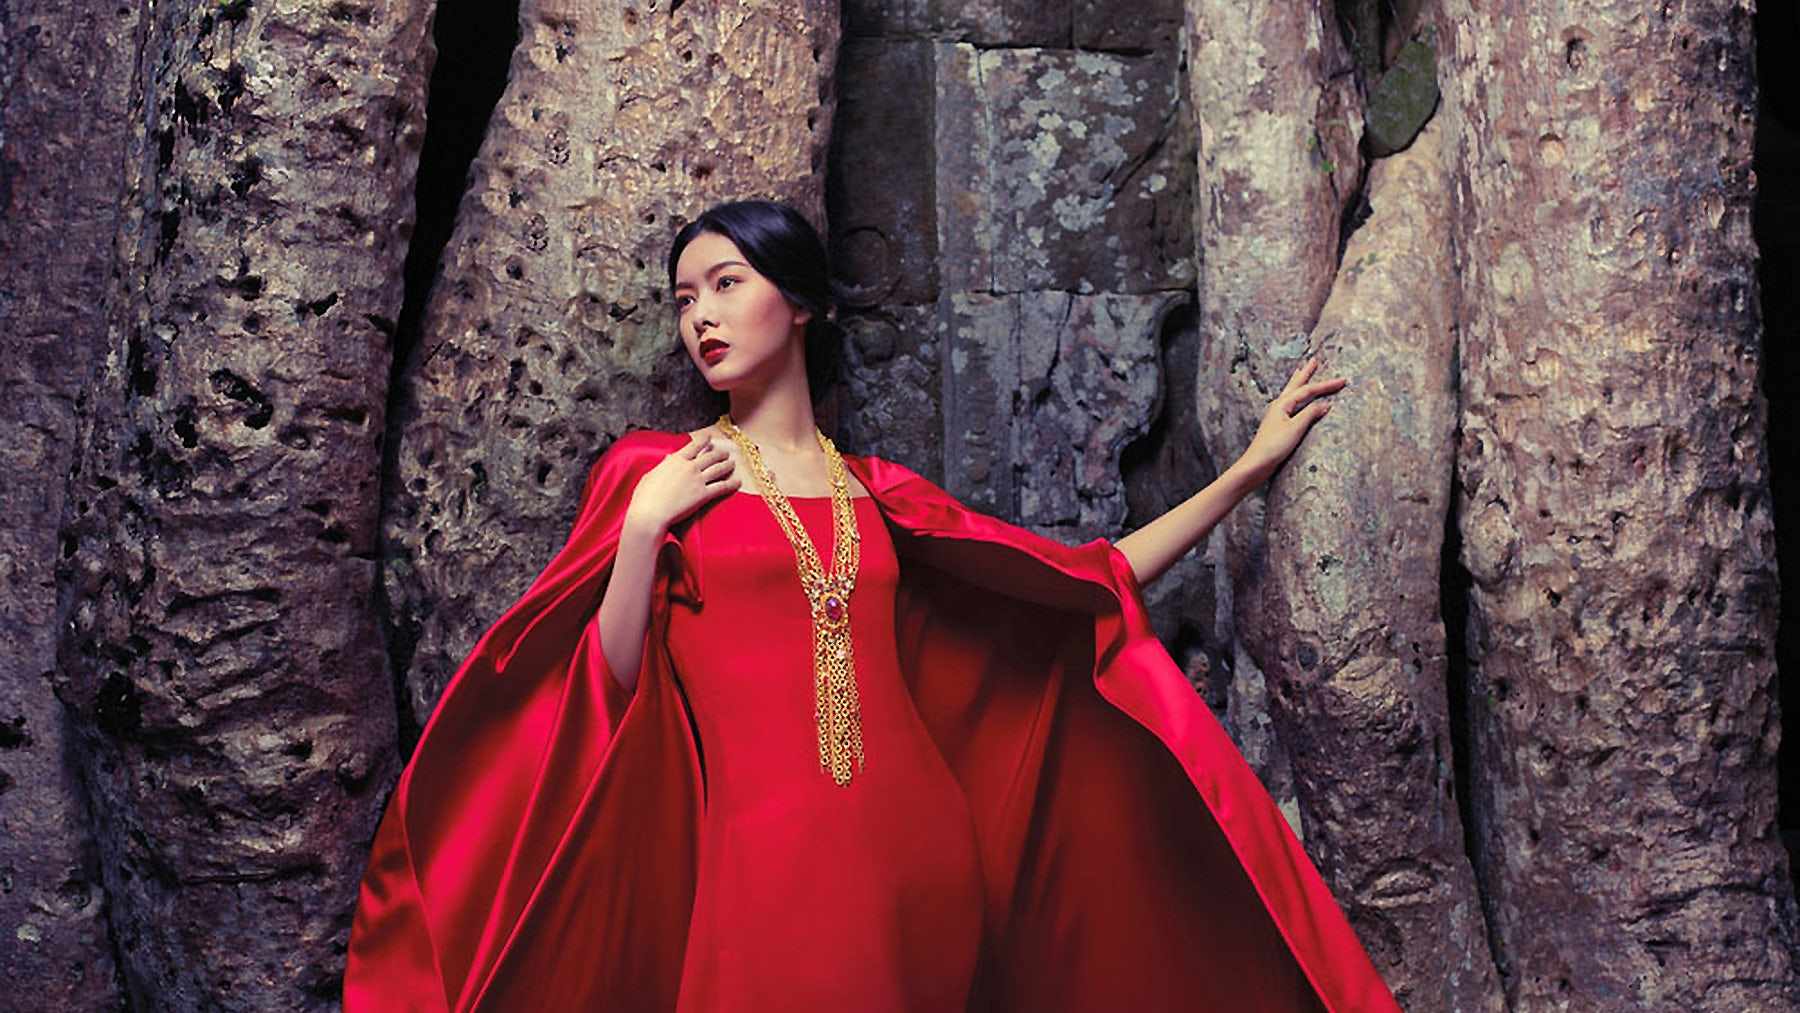 PROM DRESSING - Magazine cover